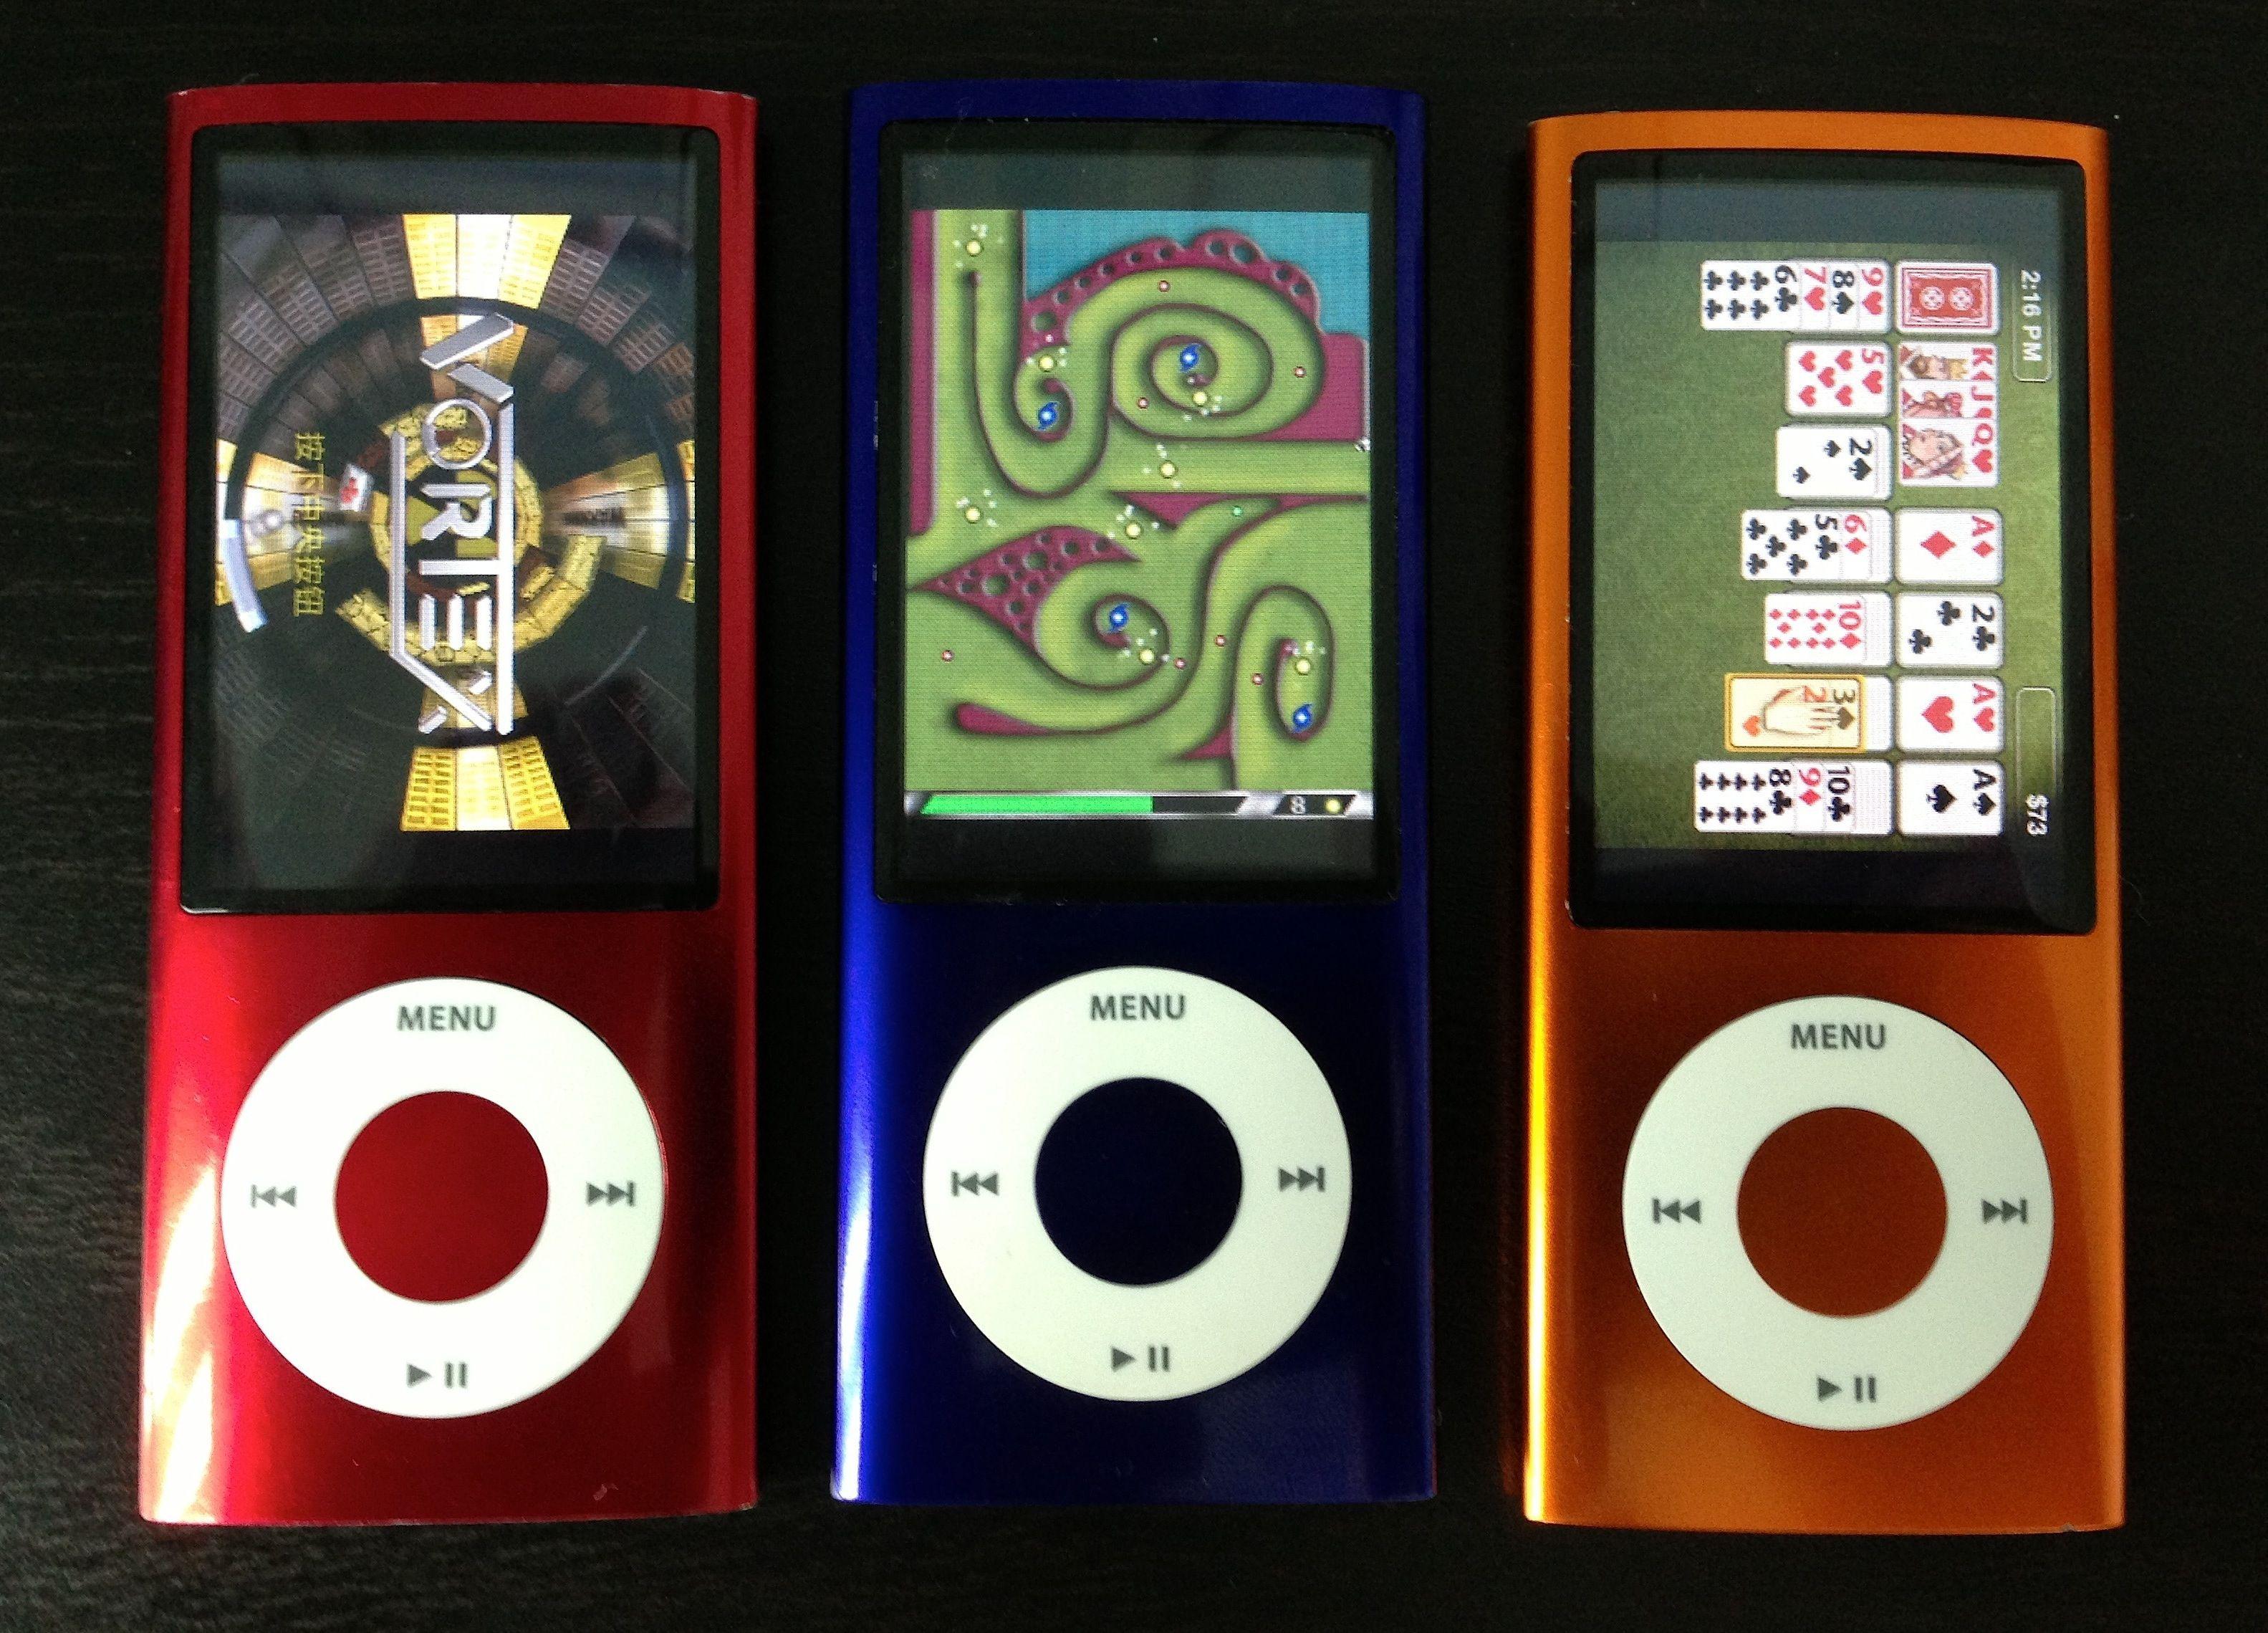 iPod nano 5 in different colors